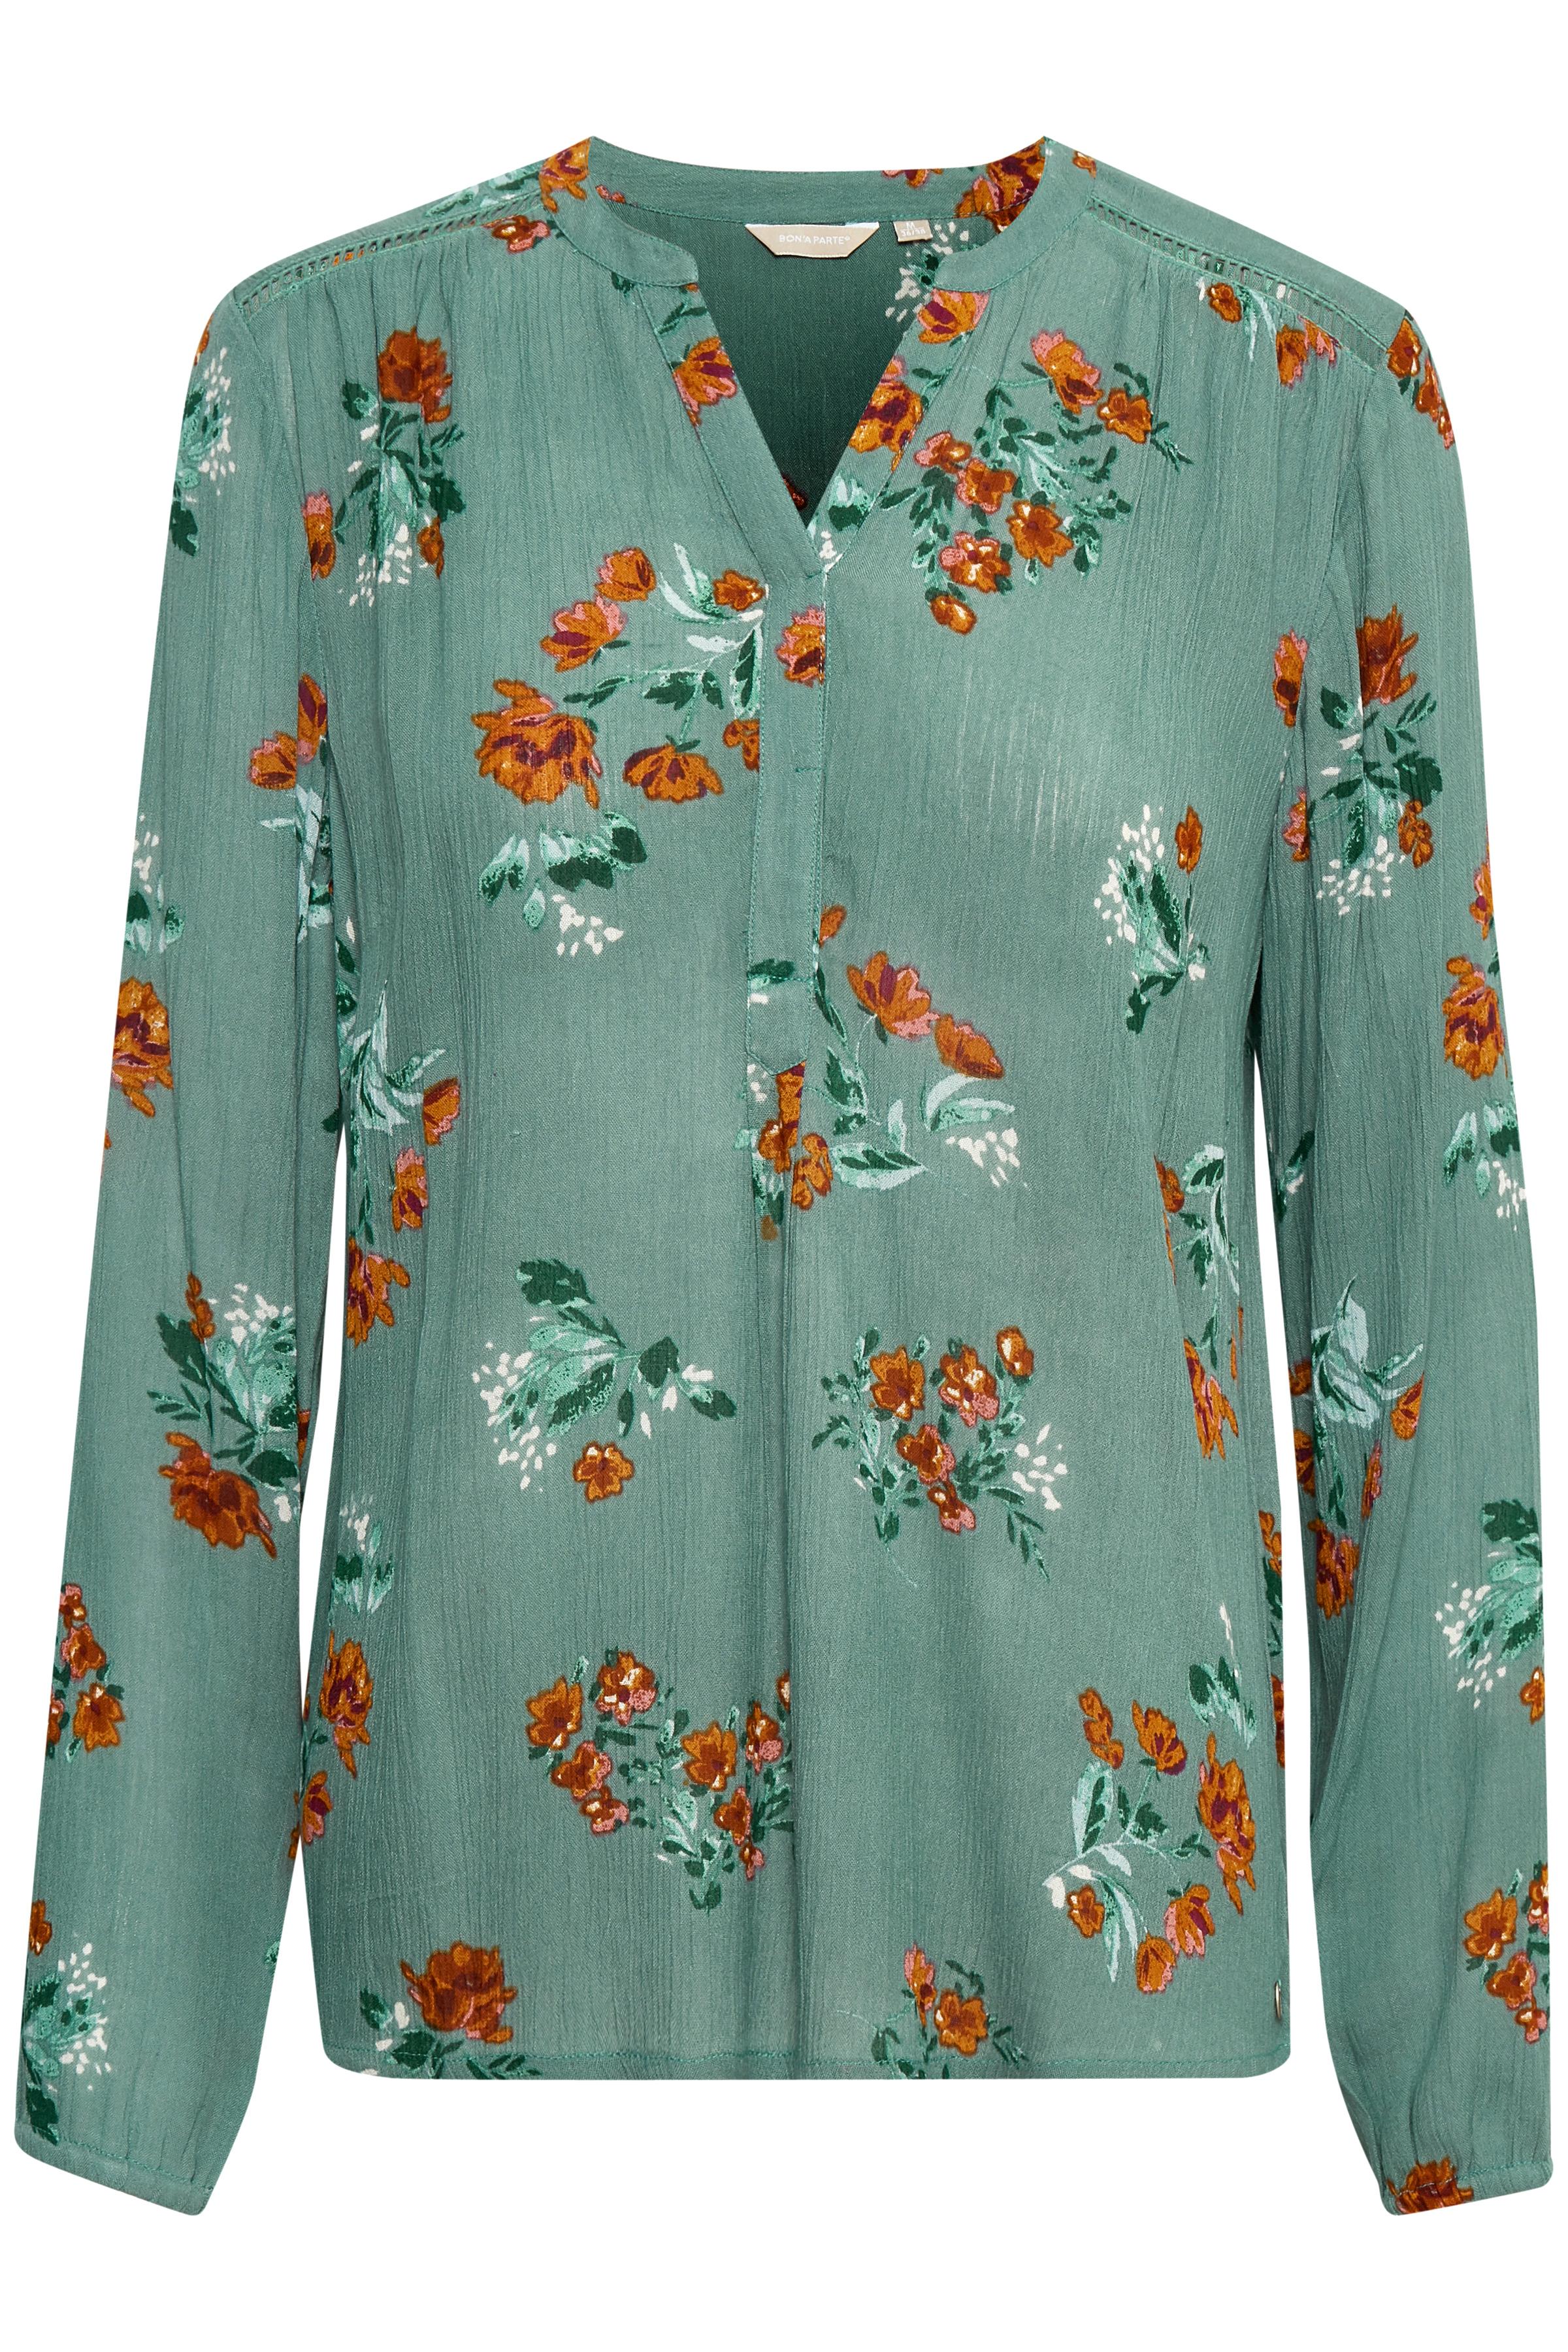 Staubopal Langarm-Bluse von Bon'A Parte – Shoppen Sie Staubopal Langarm-Bluse ab Gr. S-2XL hier